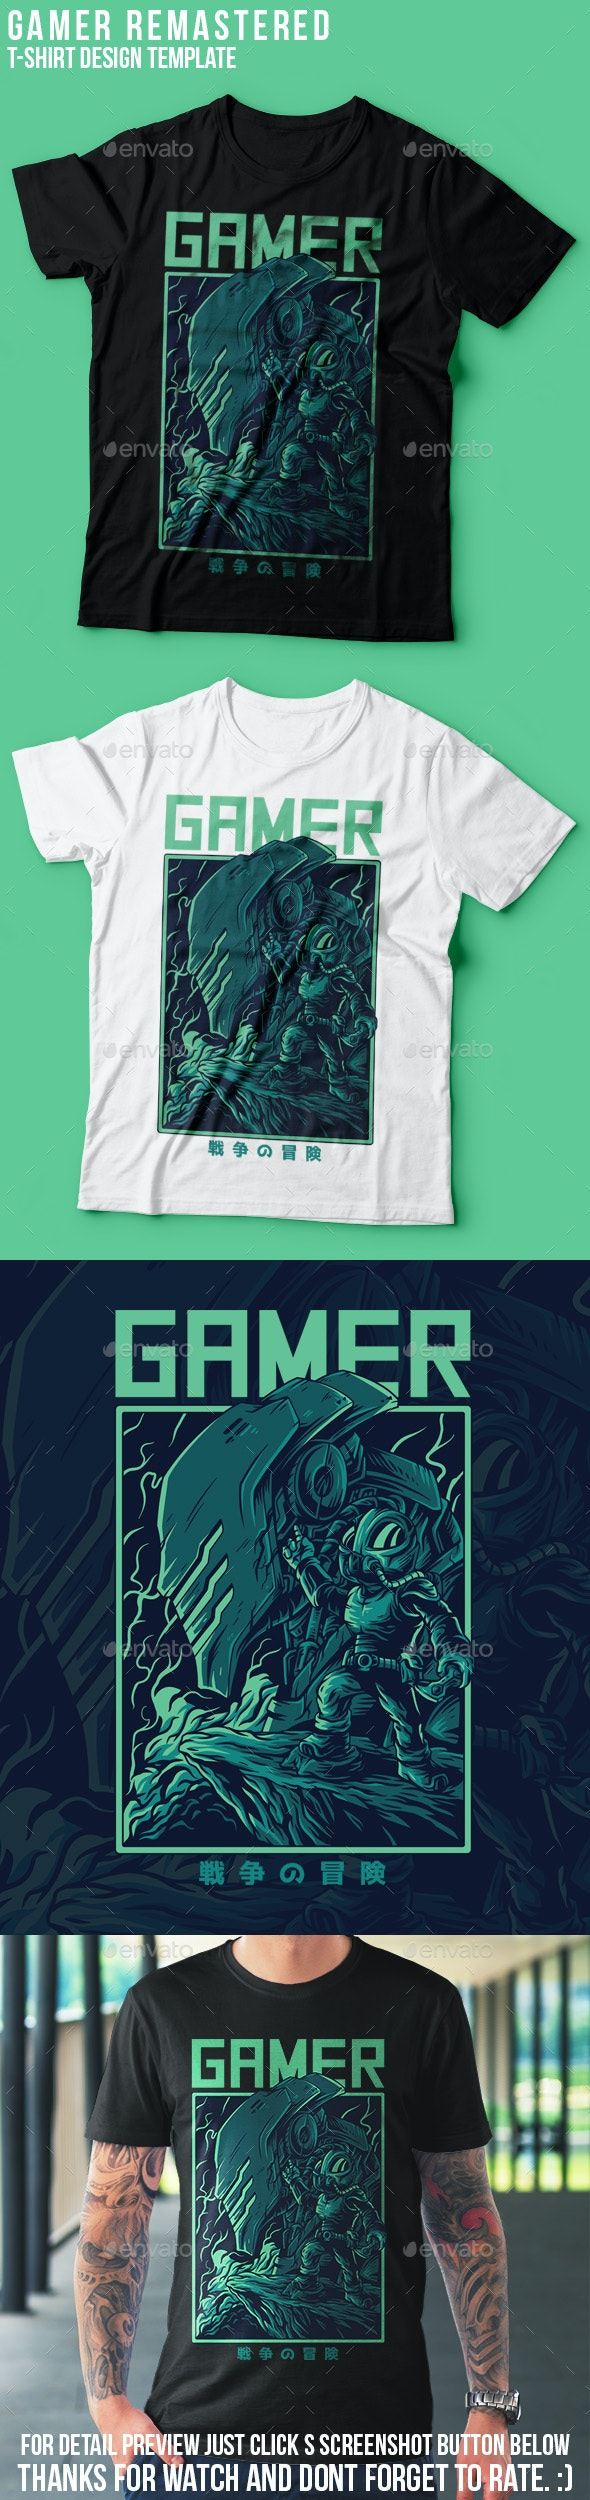 Gamer Remastered T-Shirt Design - Sports & Teams T-Shirts